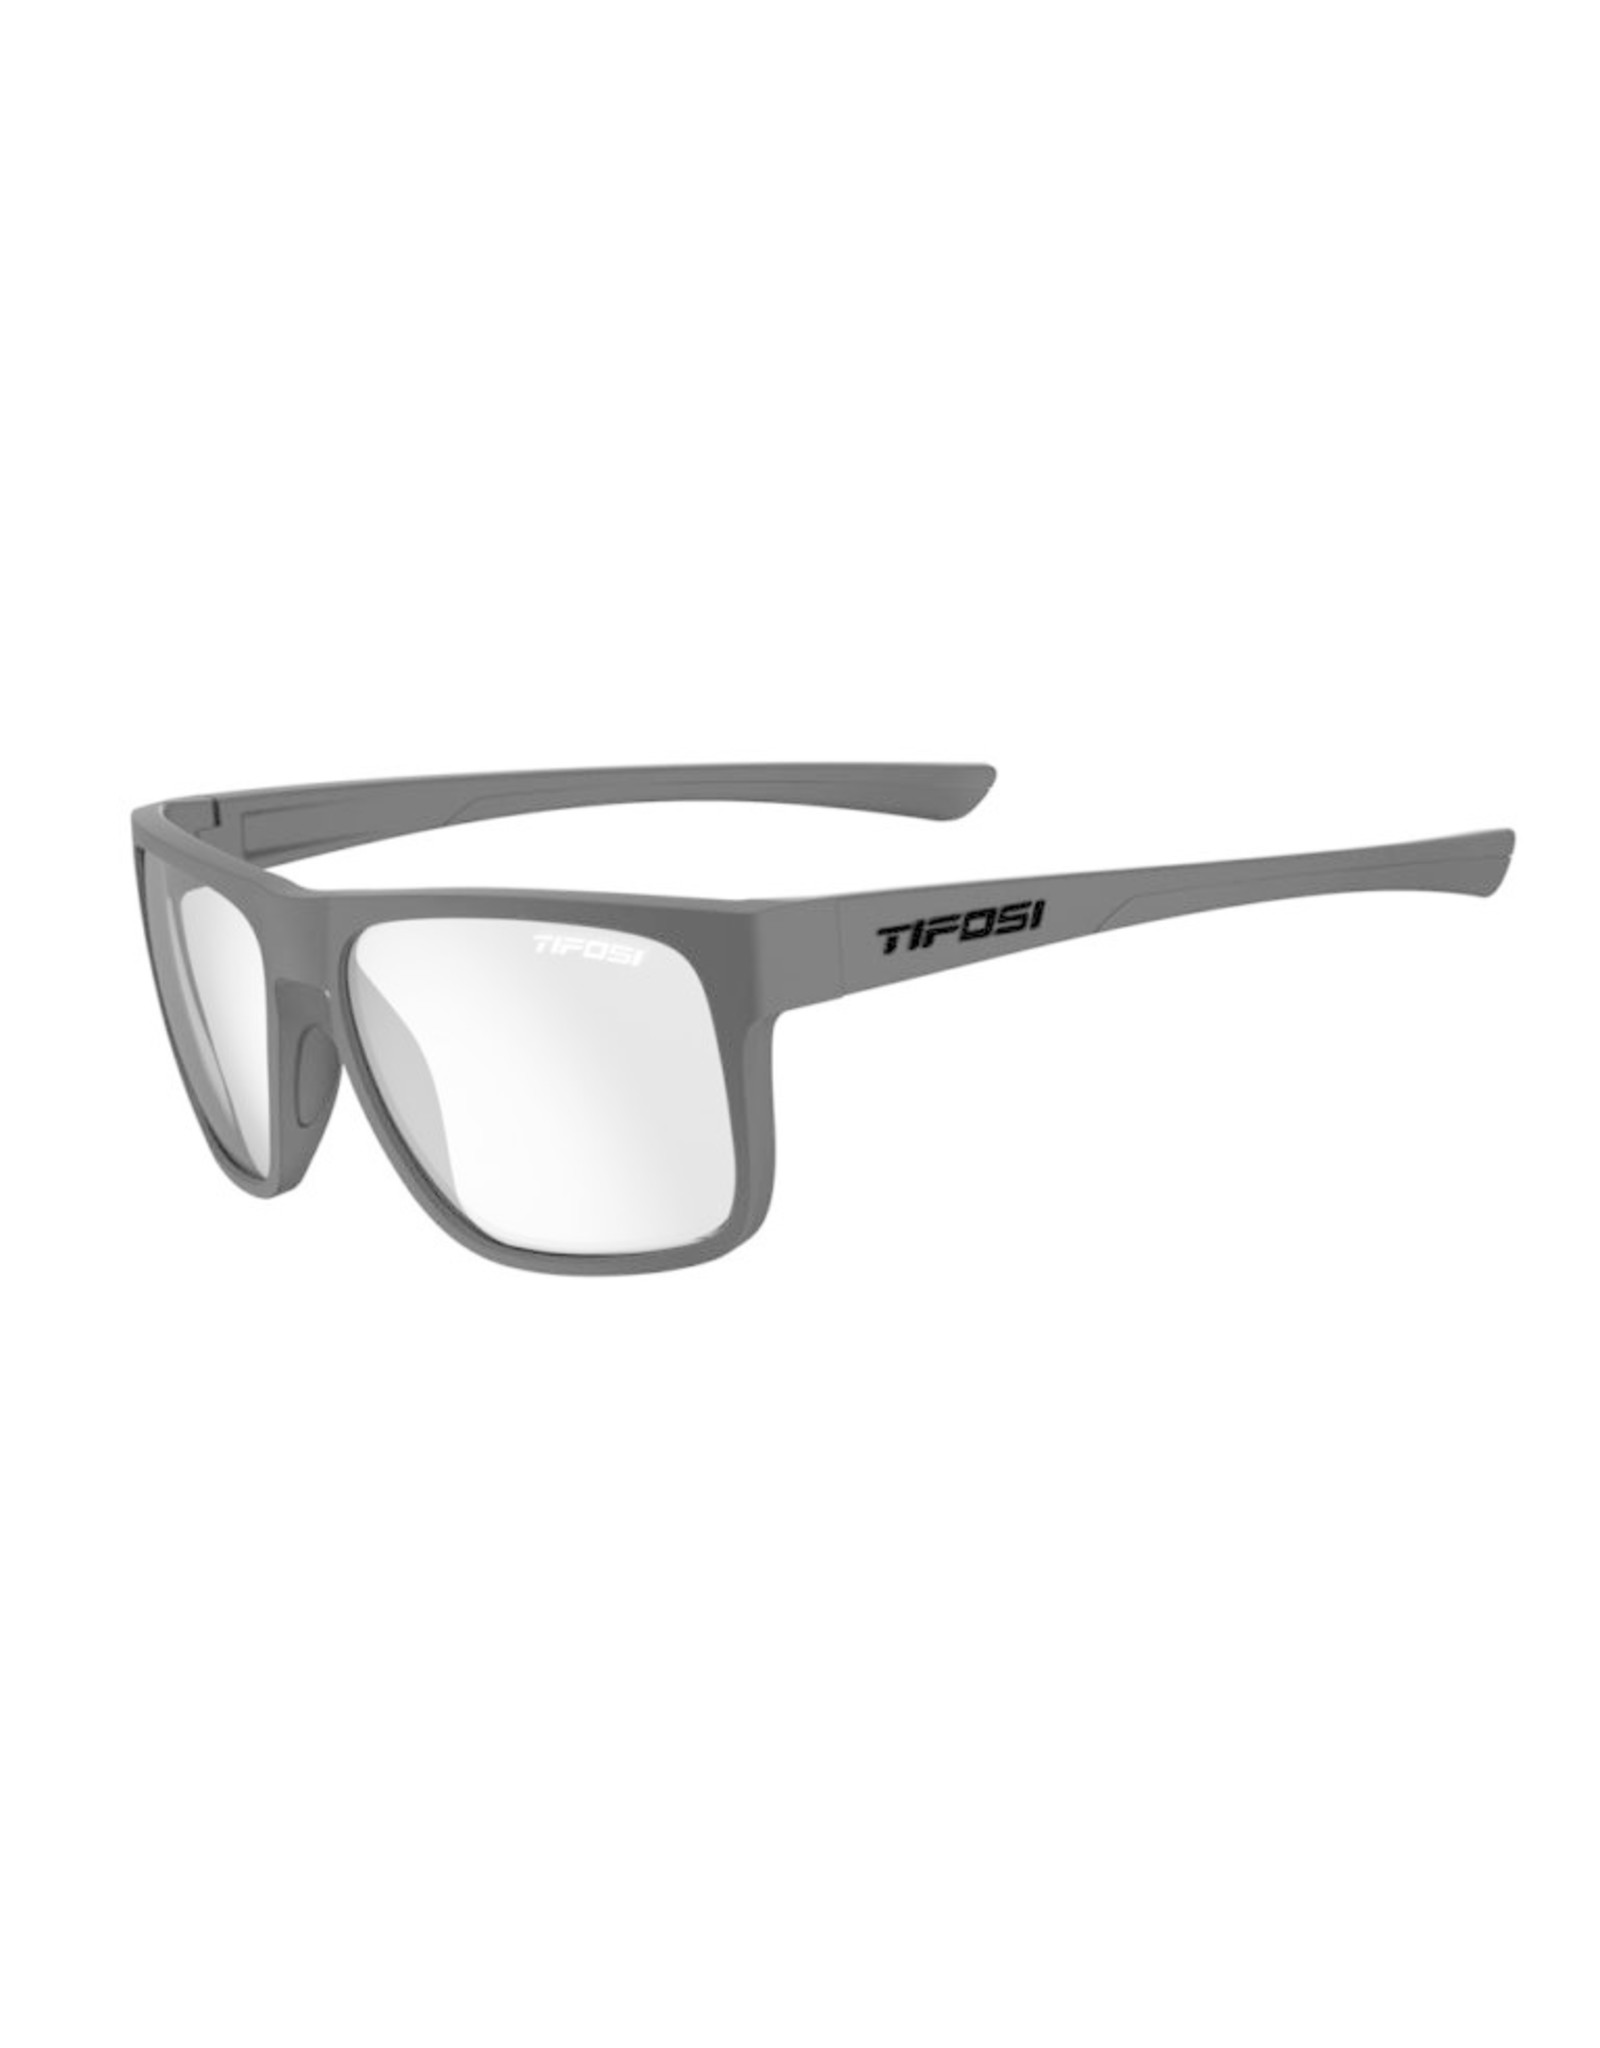 Tifosi Optics Swick, Blackout Fototec Sunglasses - Fototec Lens